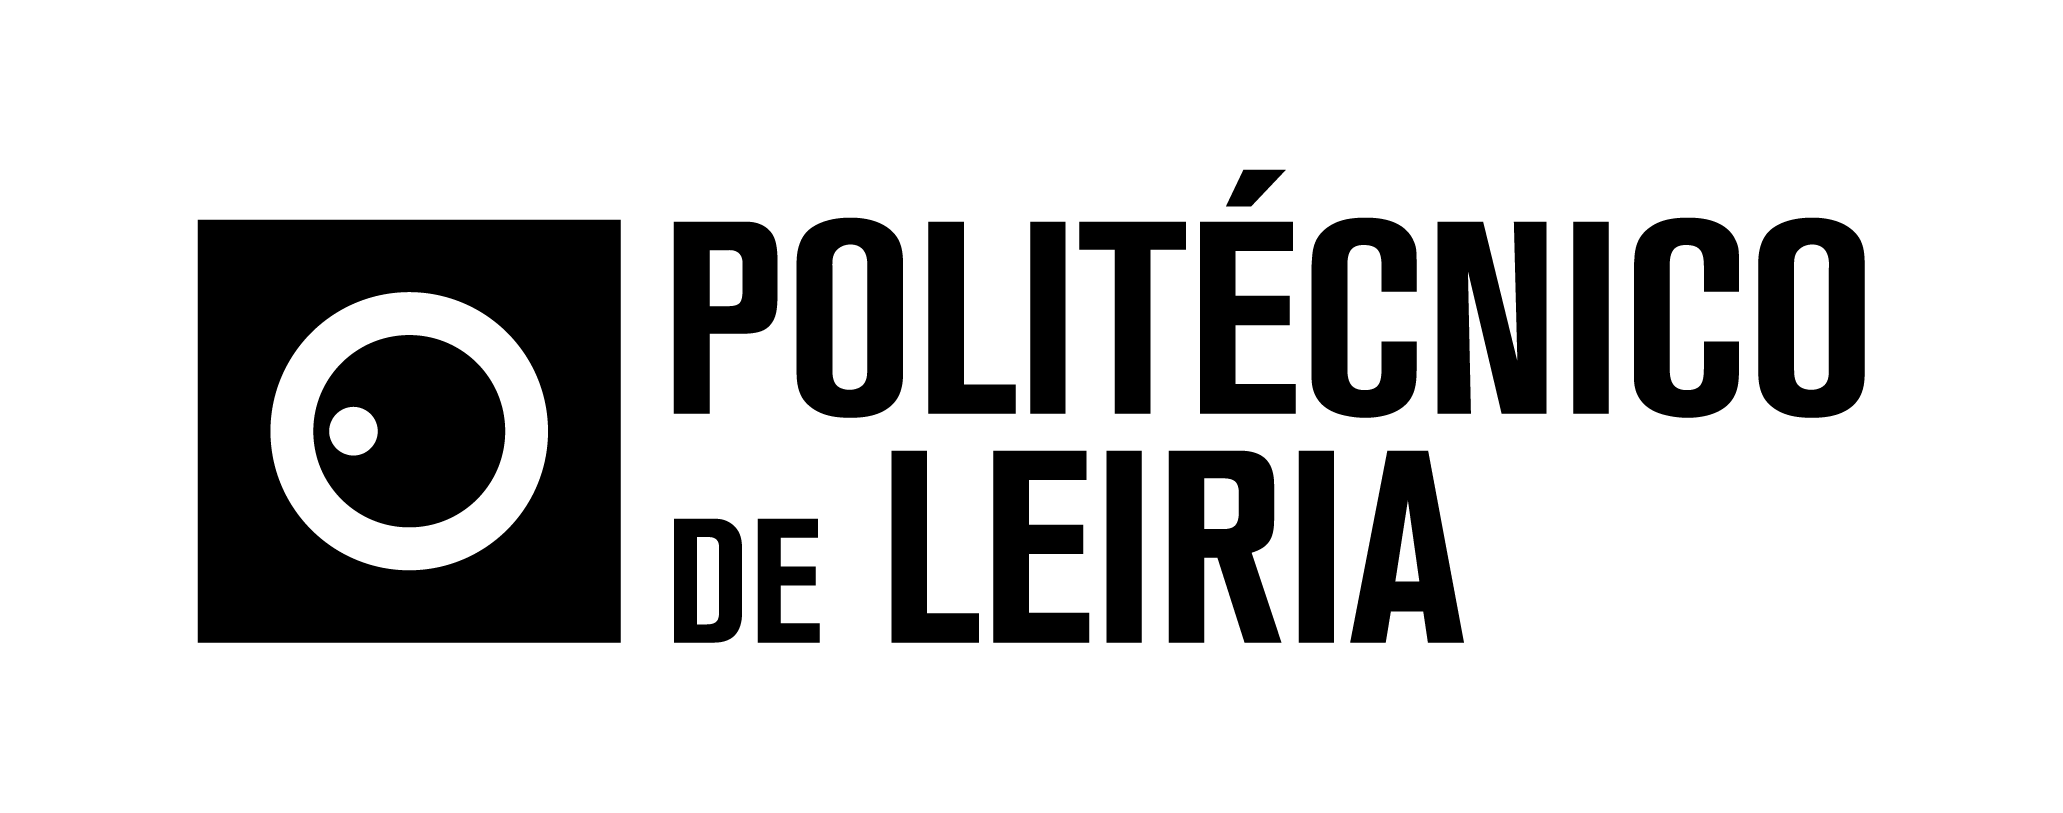 logo_Politécnico de Leiria